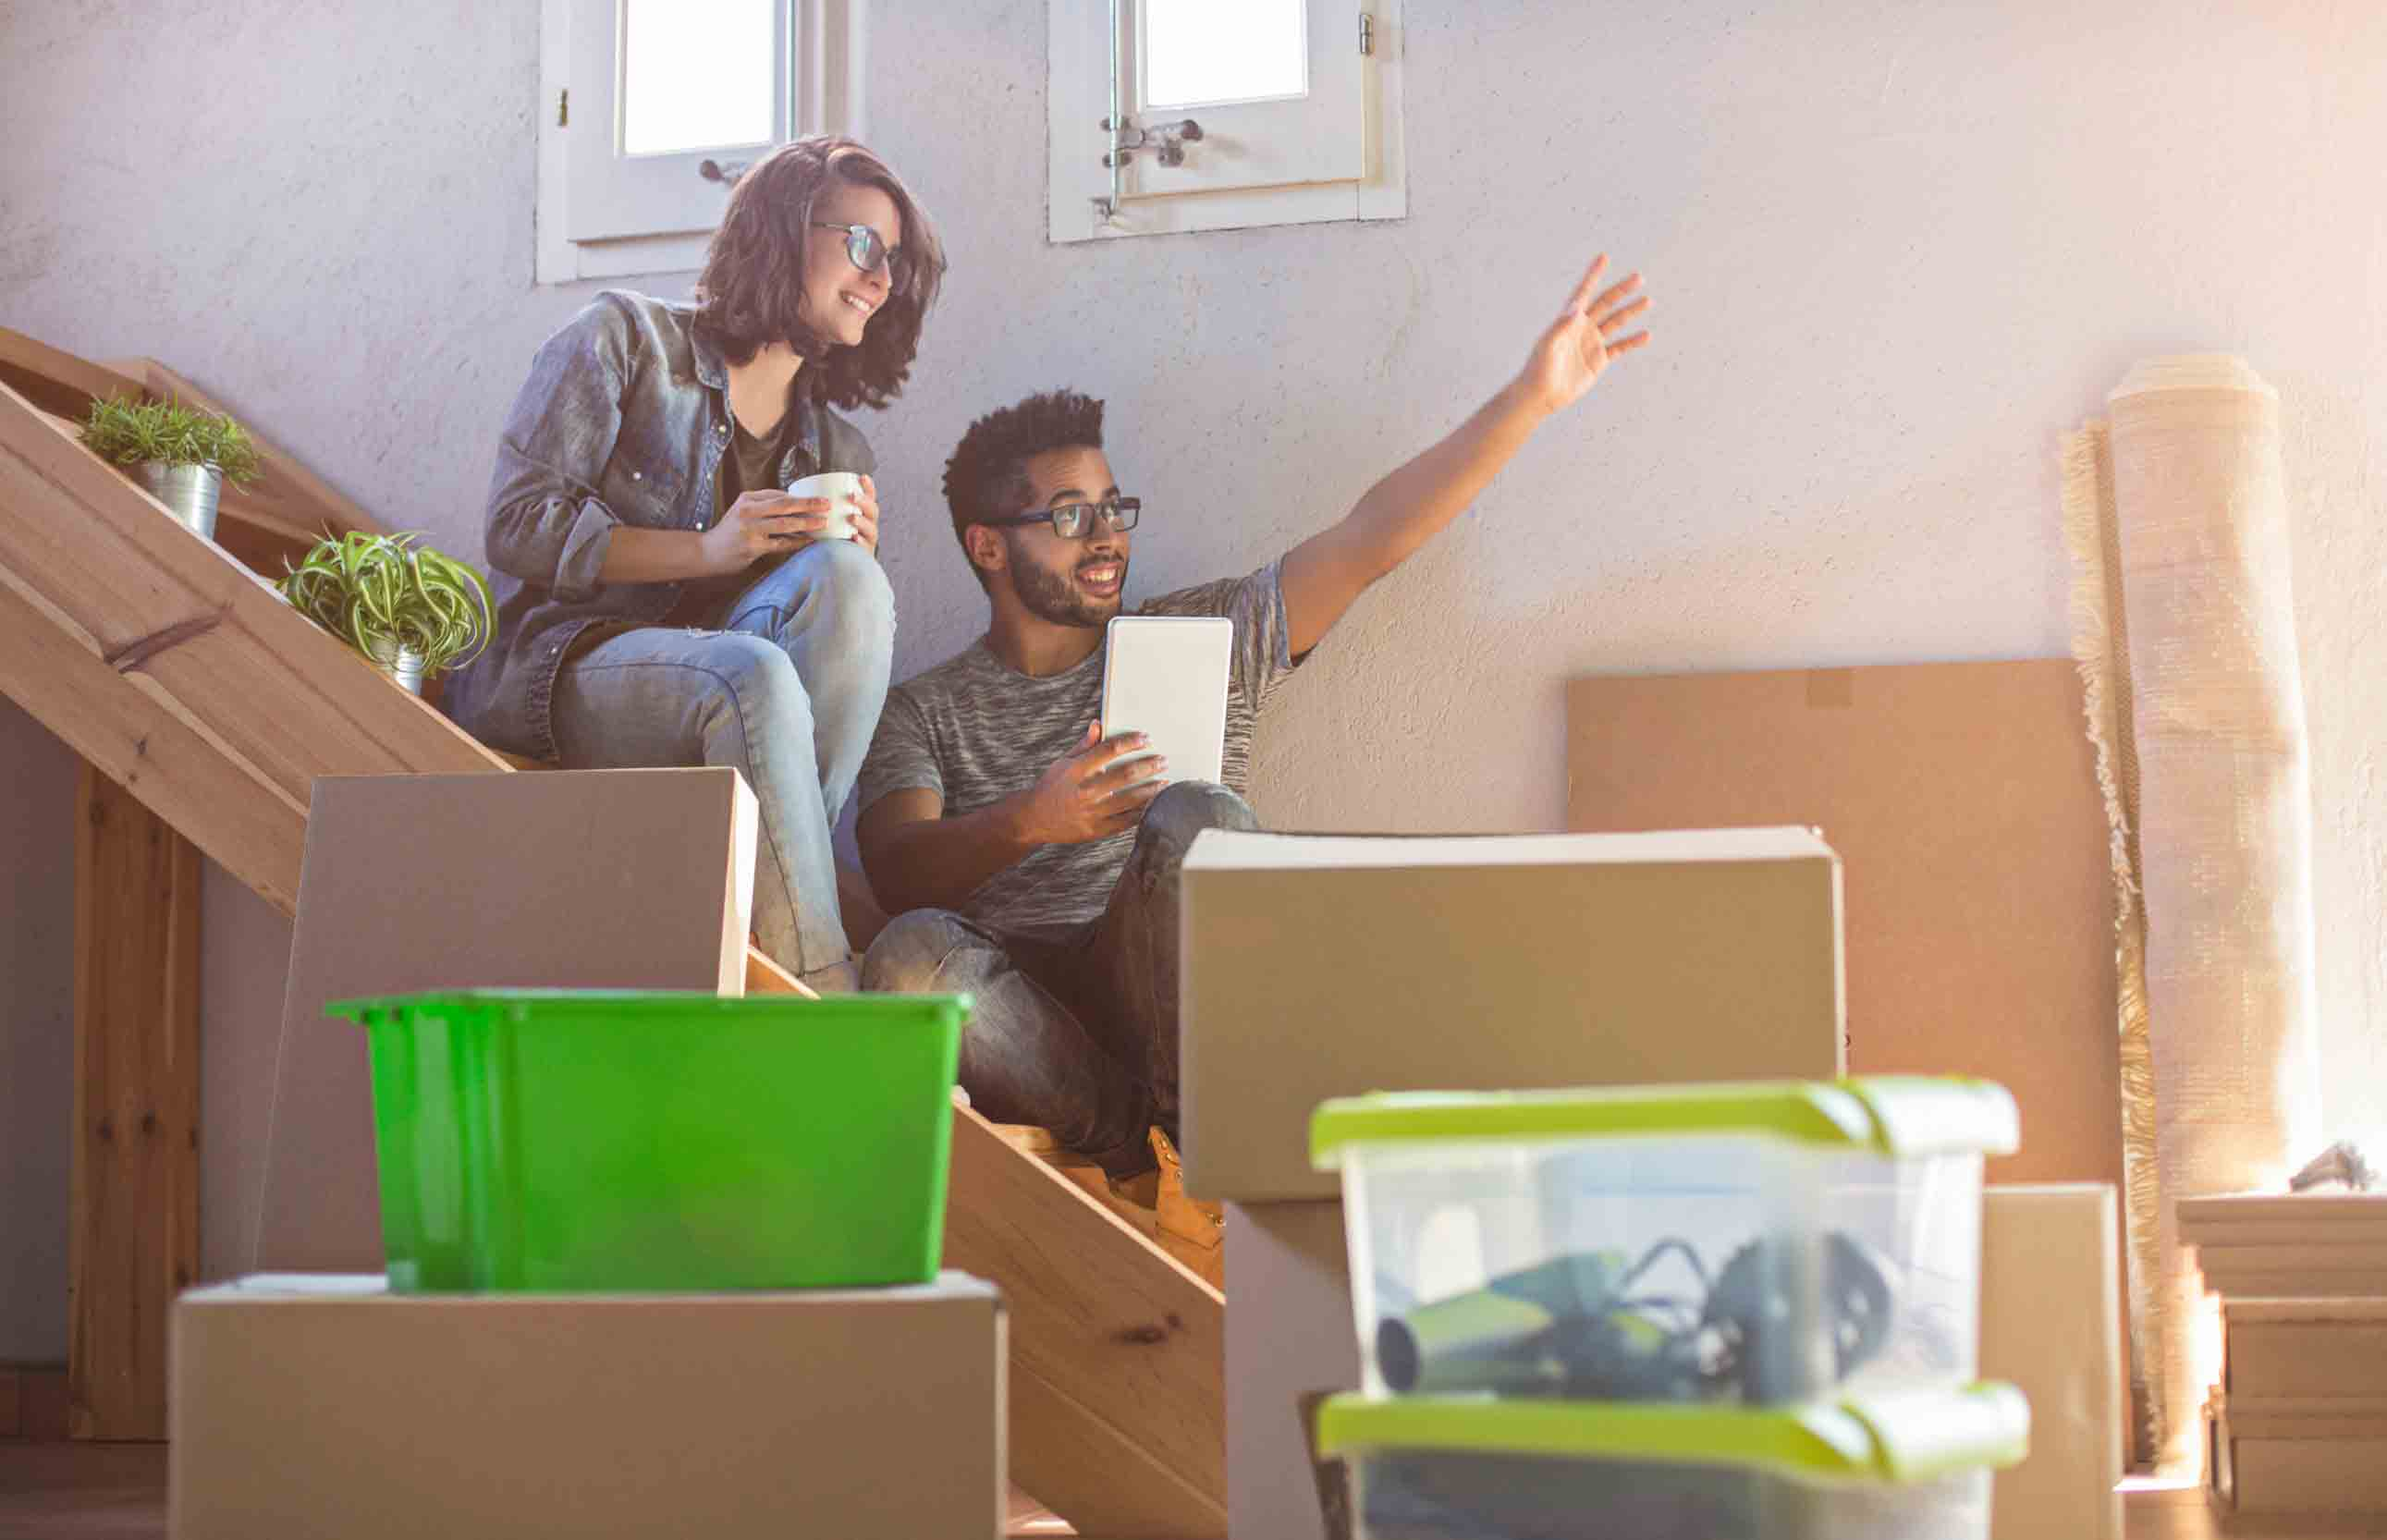 We've got 12 ways fans of bins, baskets and bathroom storage goods can lower their receipt tallies.